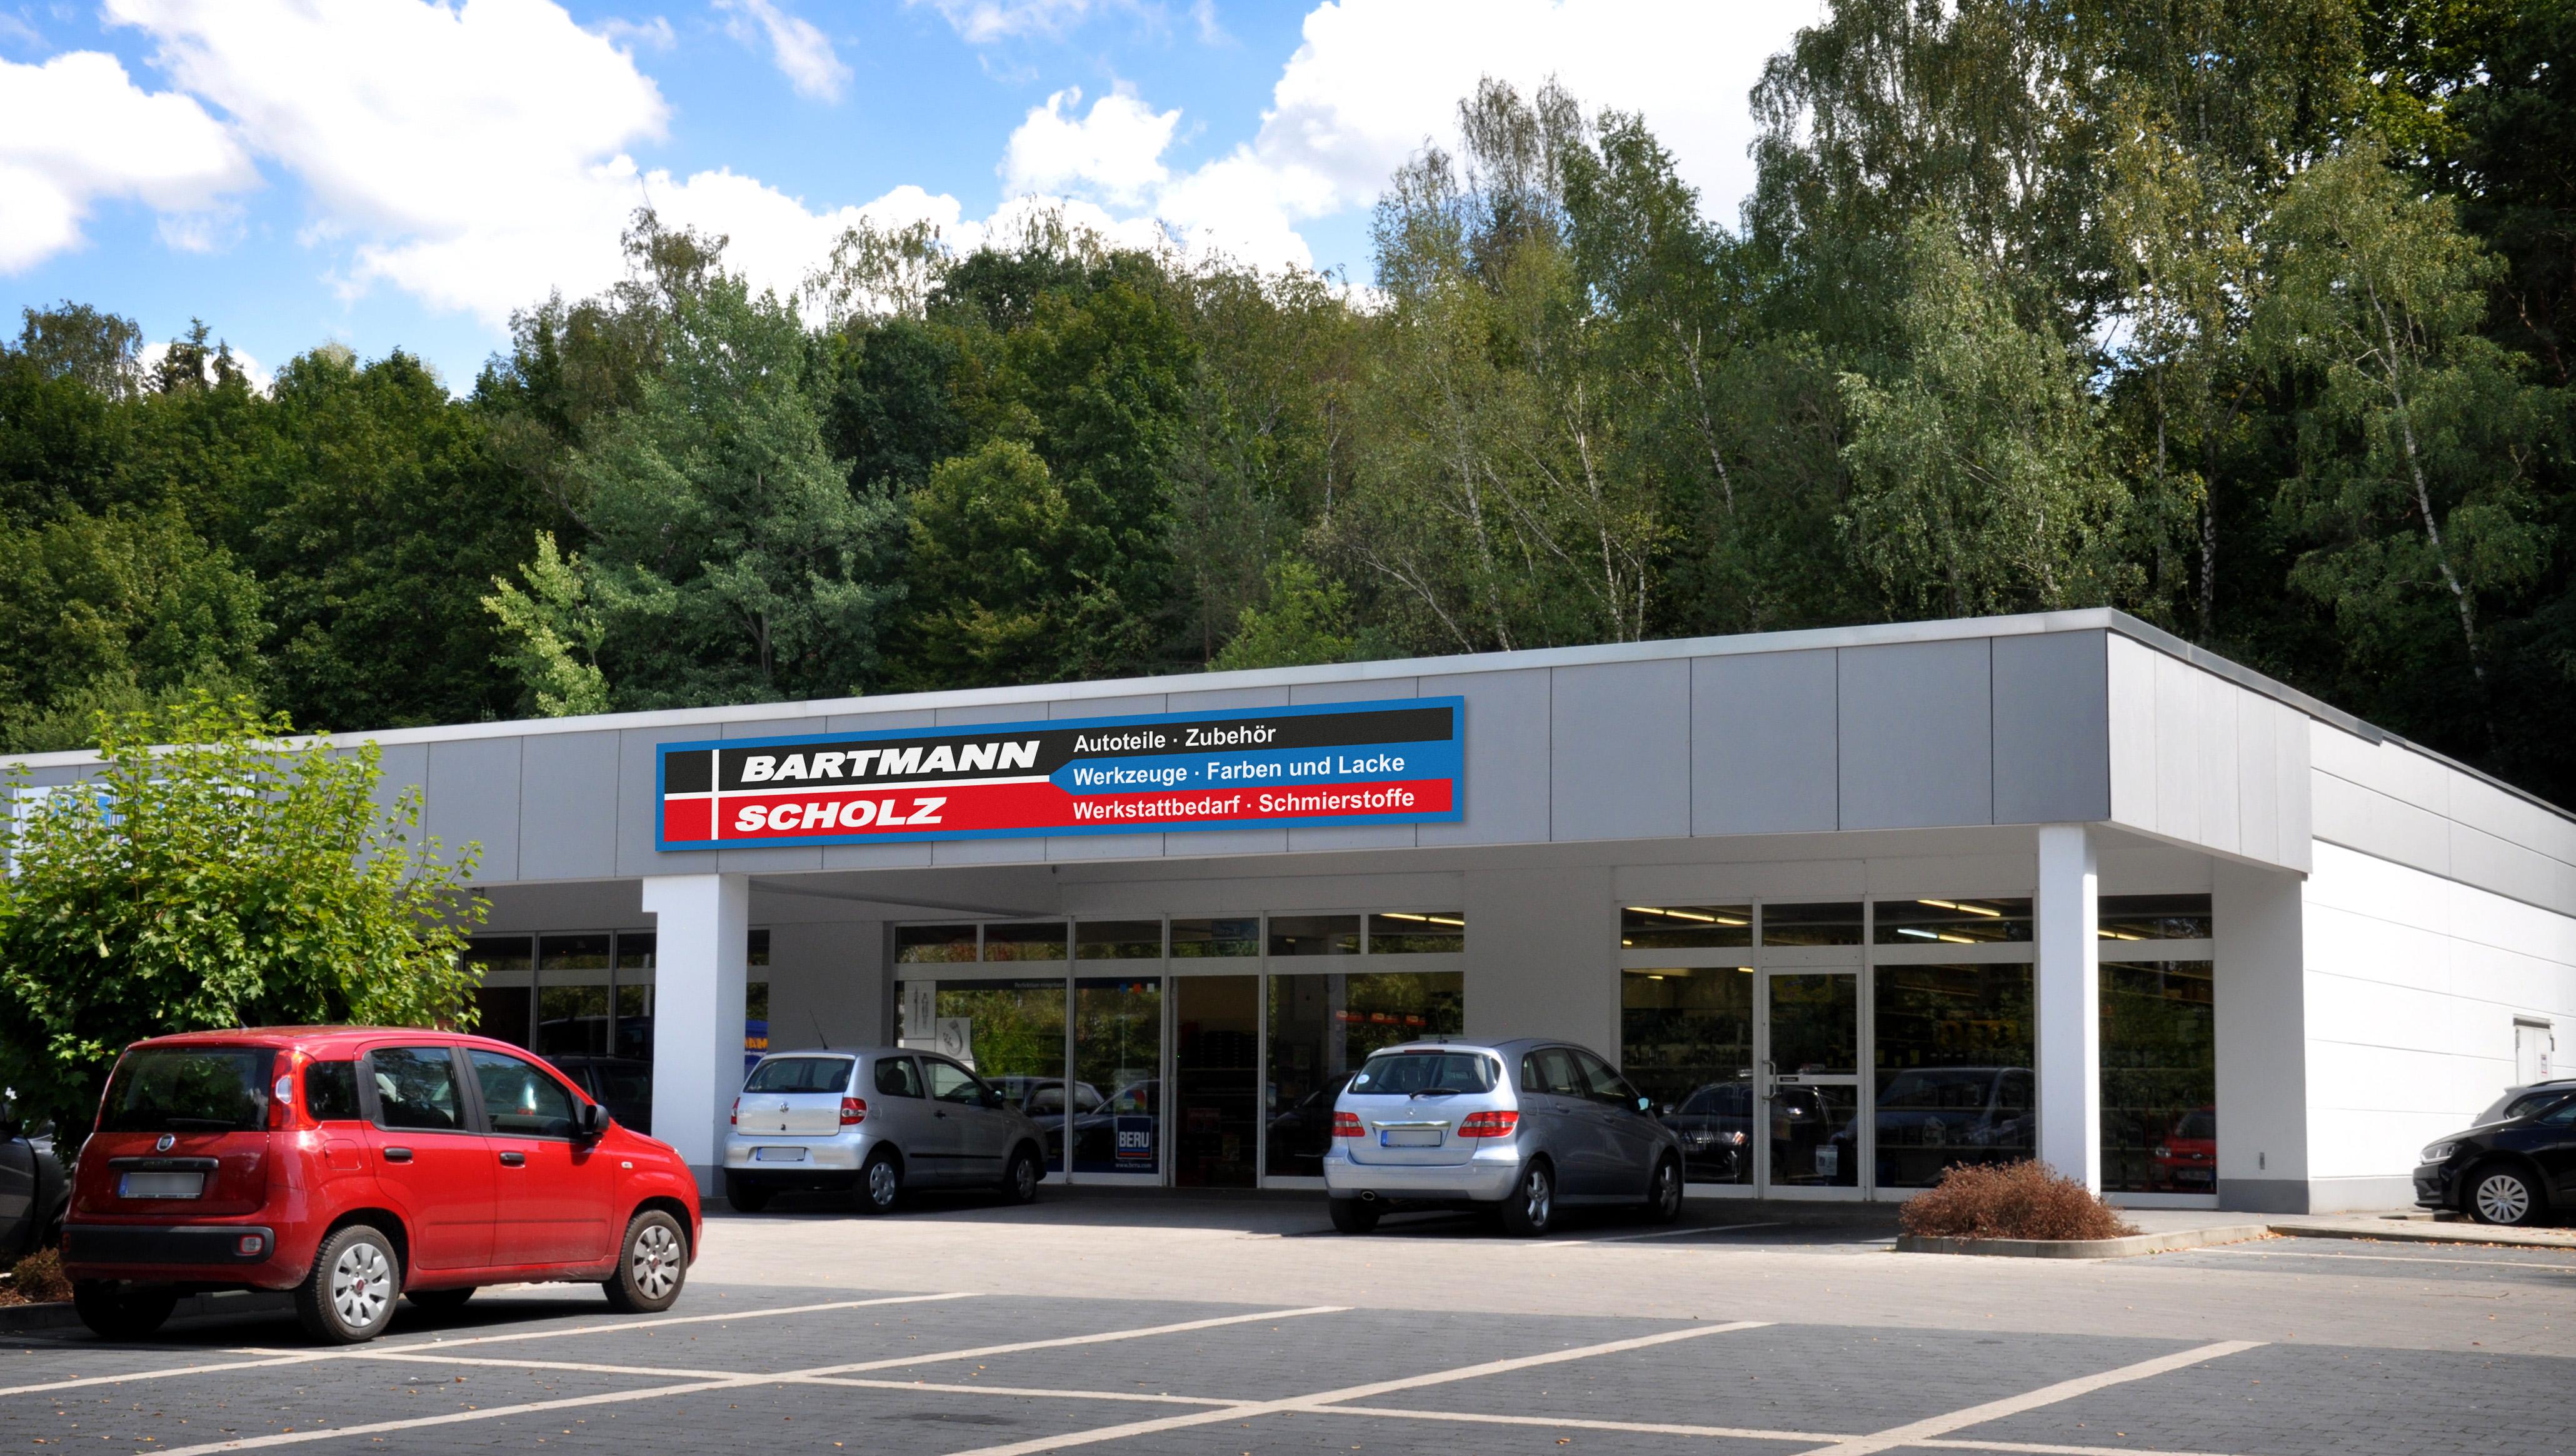 Bartmann & Scholz Kfz-Teile-Großhandels GmbH